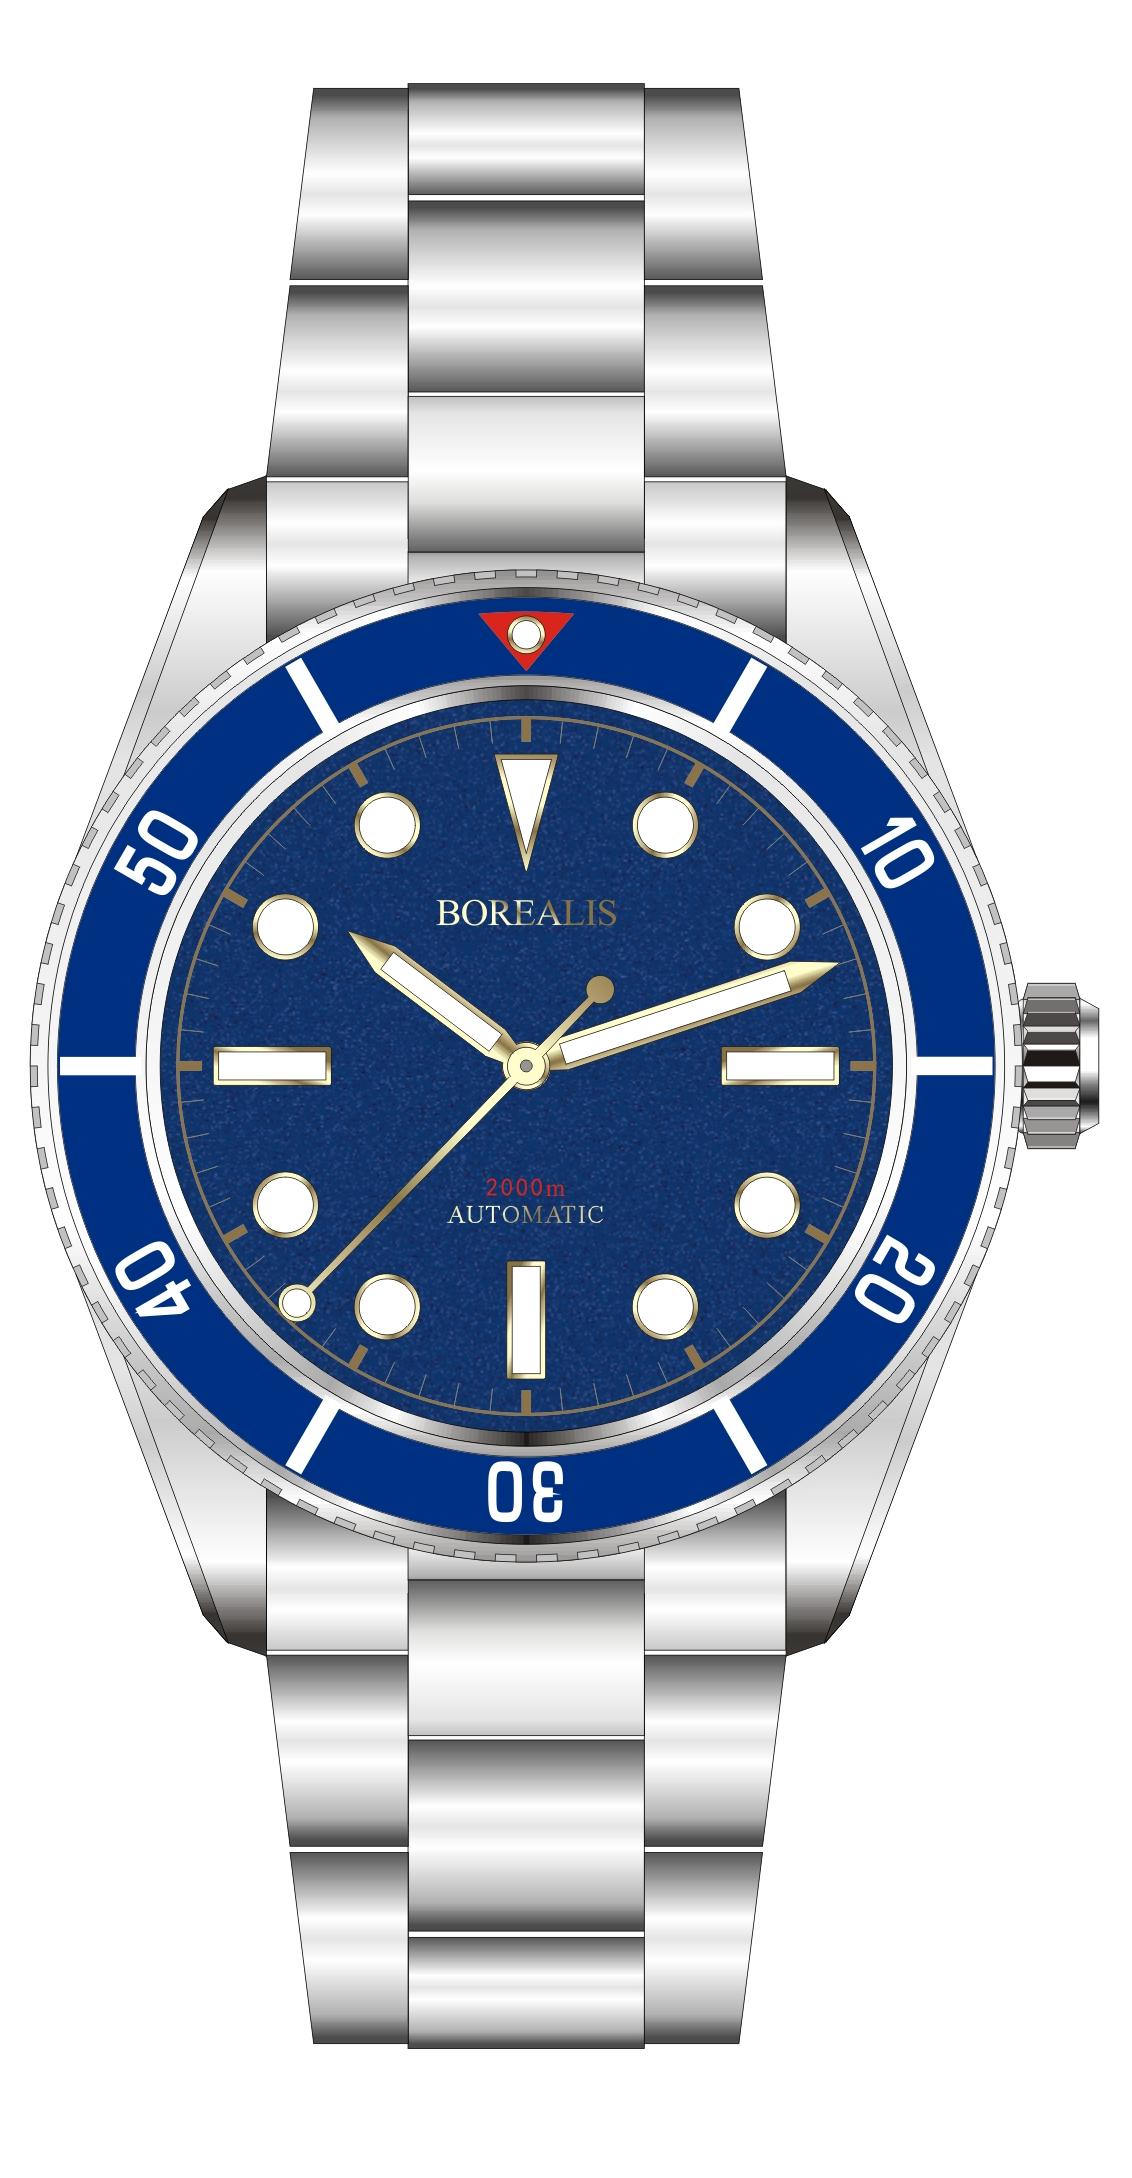 Borealis Bull Shark Automatic Diver Watch No Date Miyota 9015 Ceramic Blue Bezel Blue Dial BBSBLBBLDND